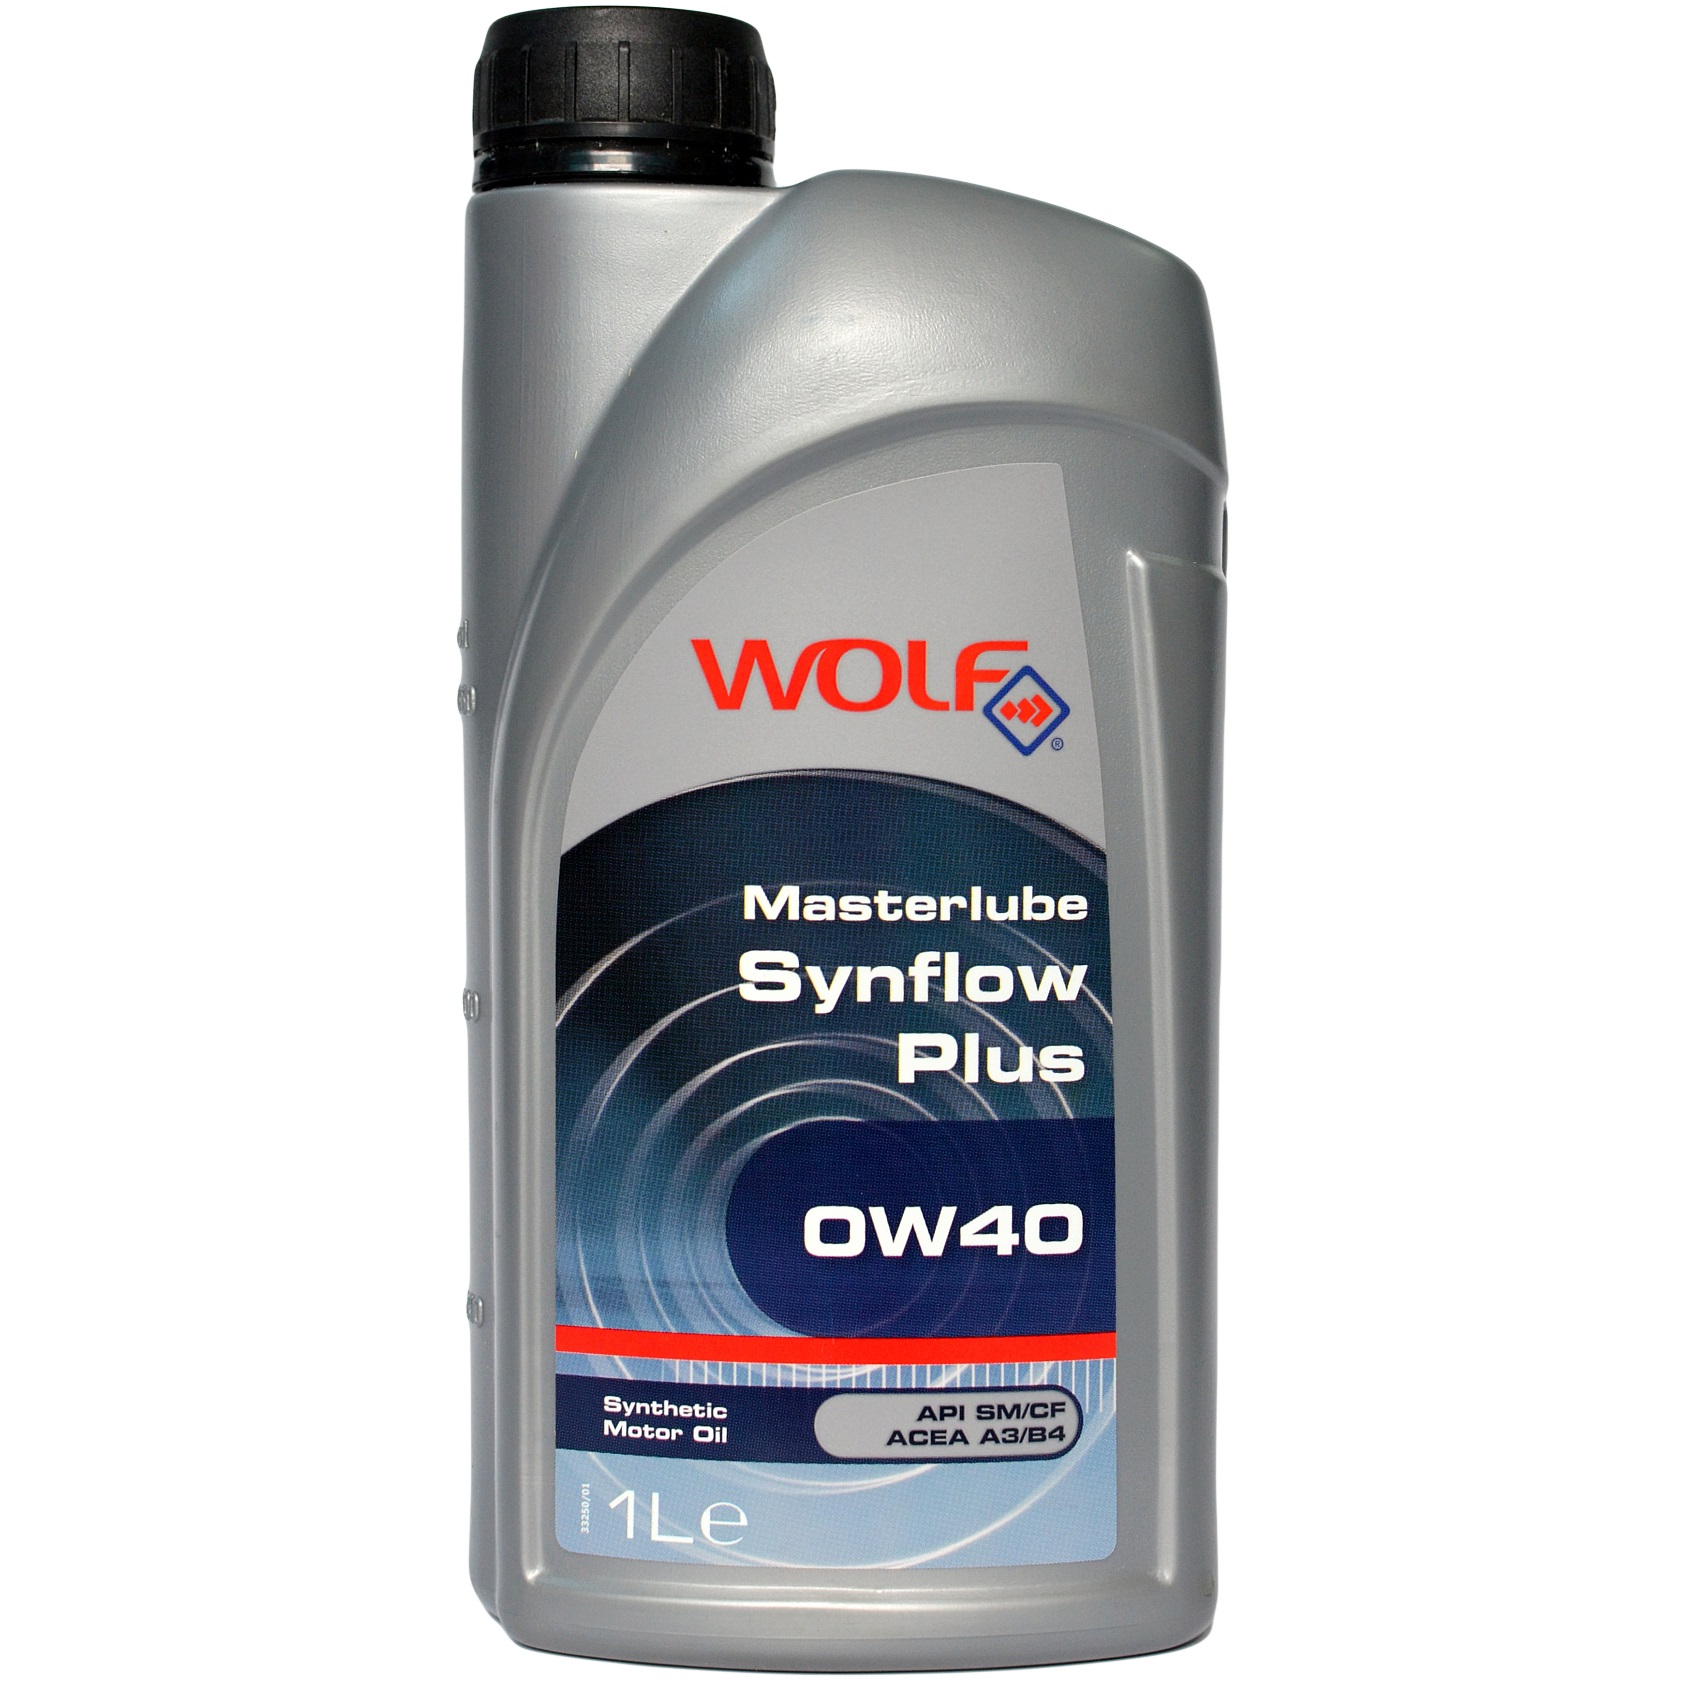 ULEI MOTOR WOLF MASTERLUBE SYNFLOW PLUS 0W40 1L